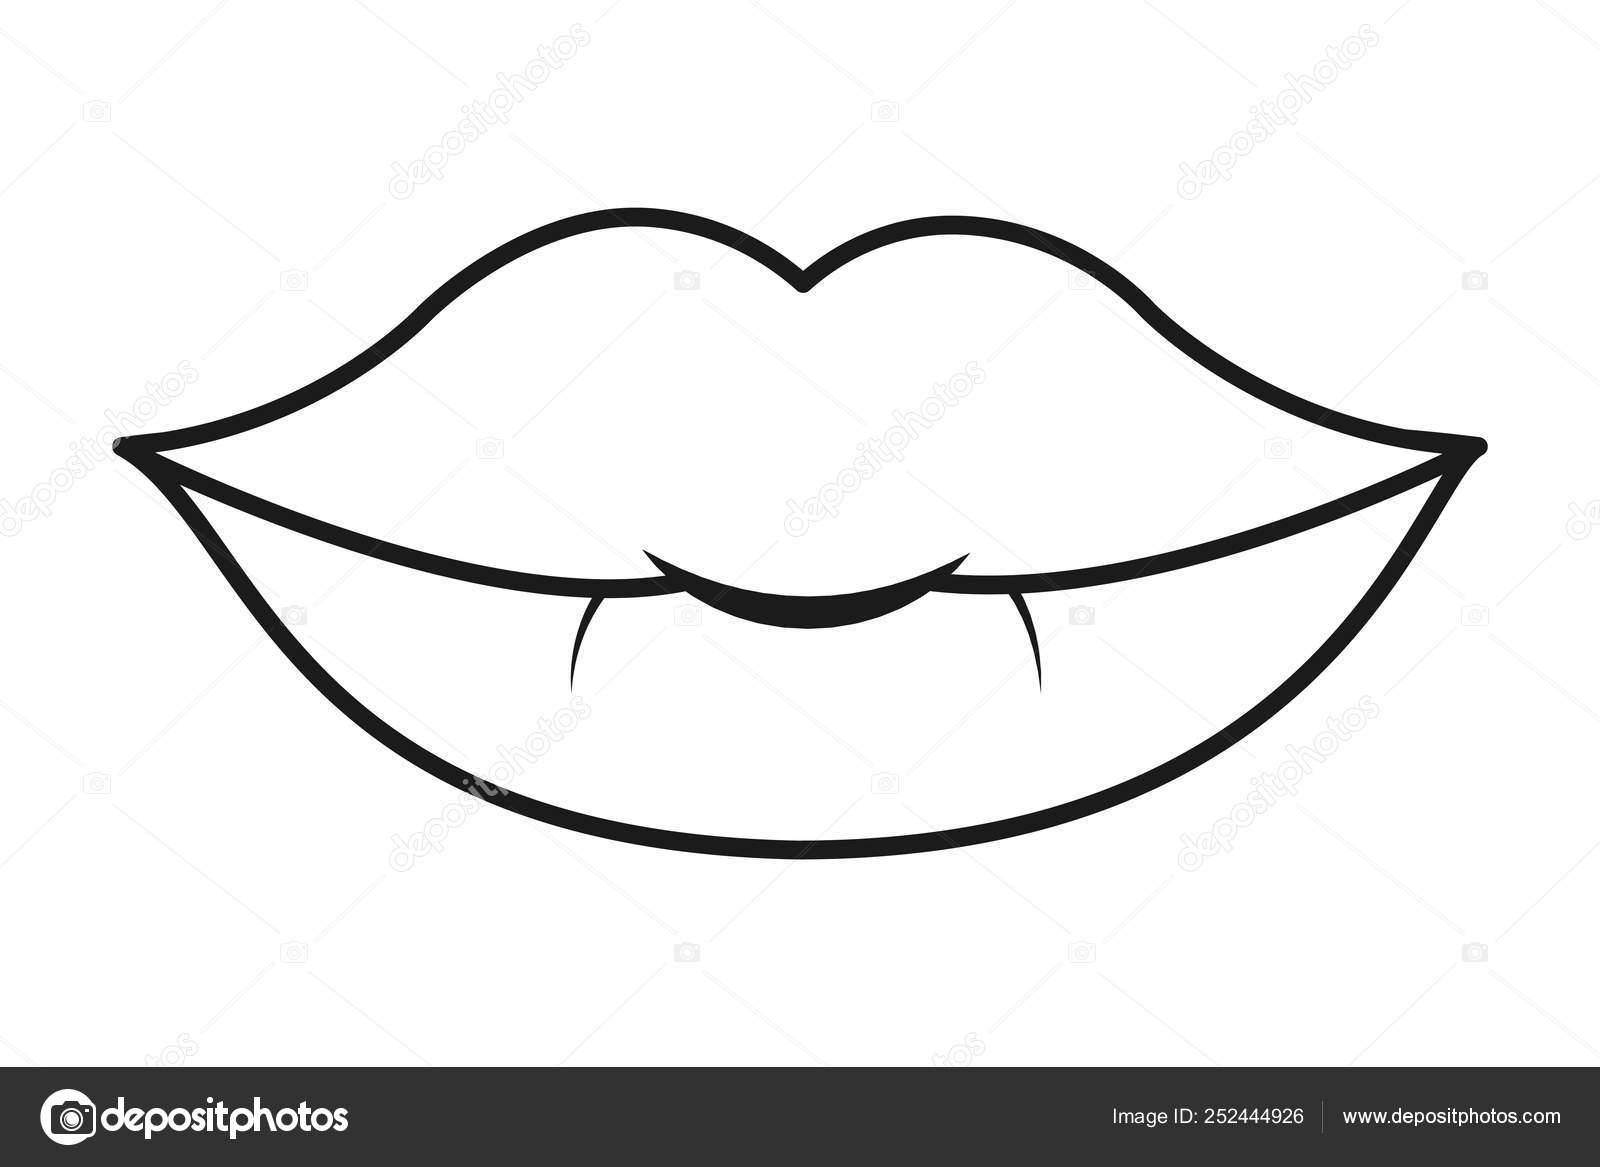 Retro Sexy Pop Art Lips Cartoon Vector Illustration Graphic Design Stock Vector C Stockgiu 252444926